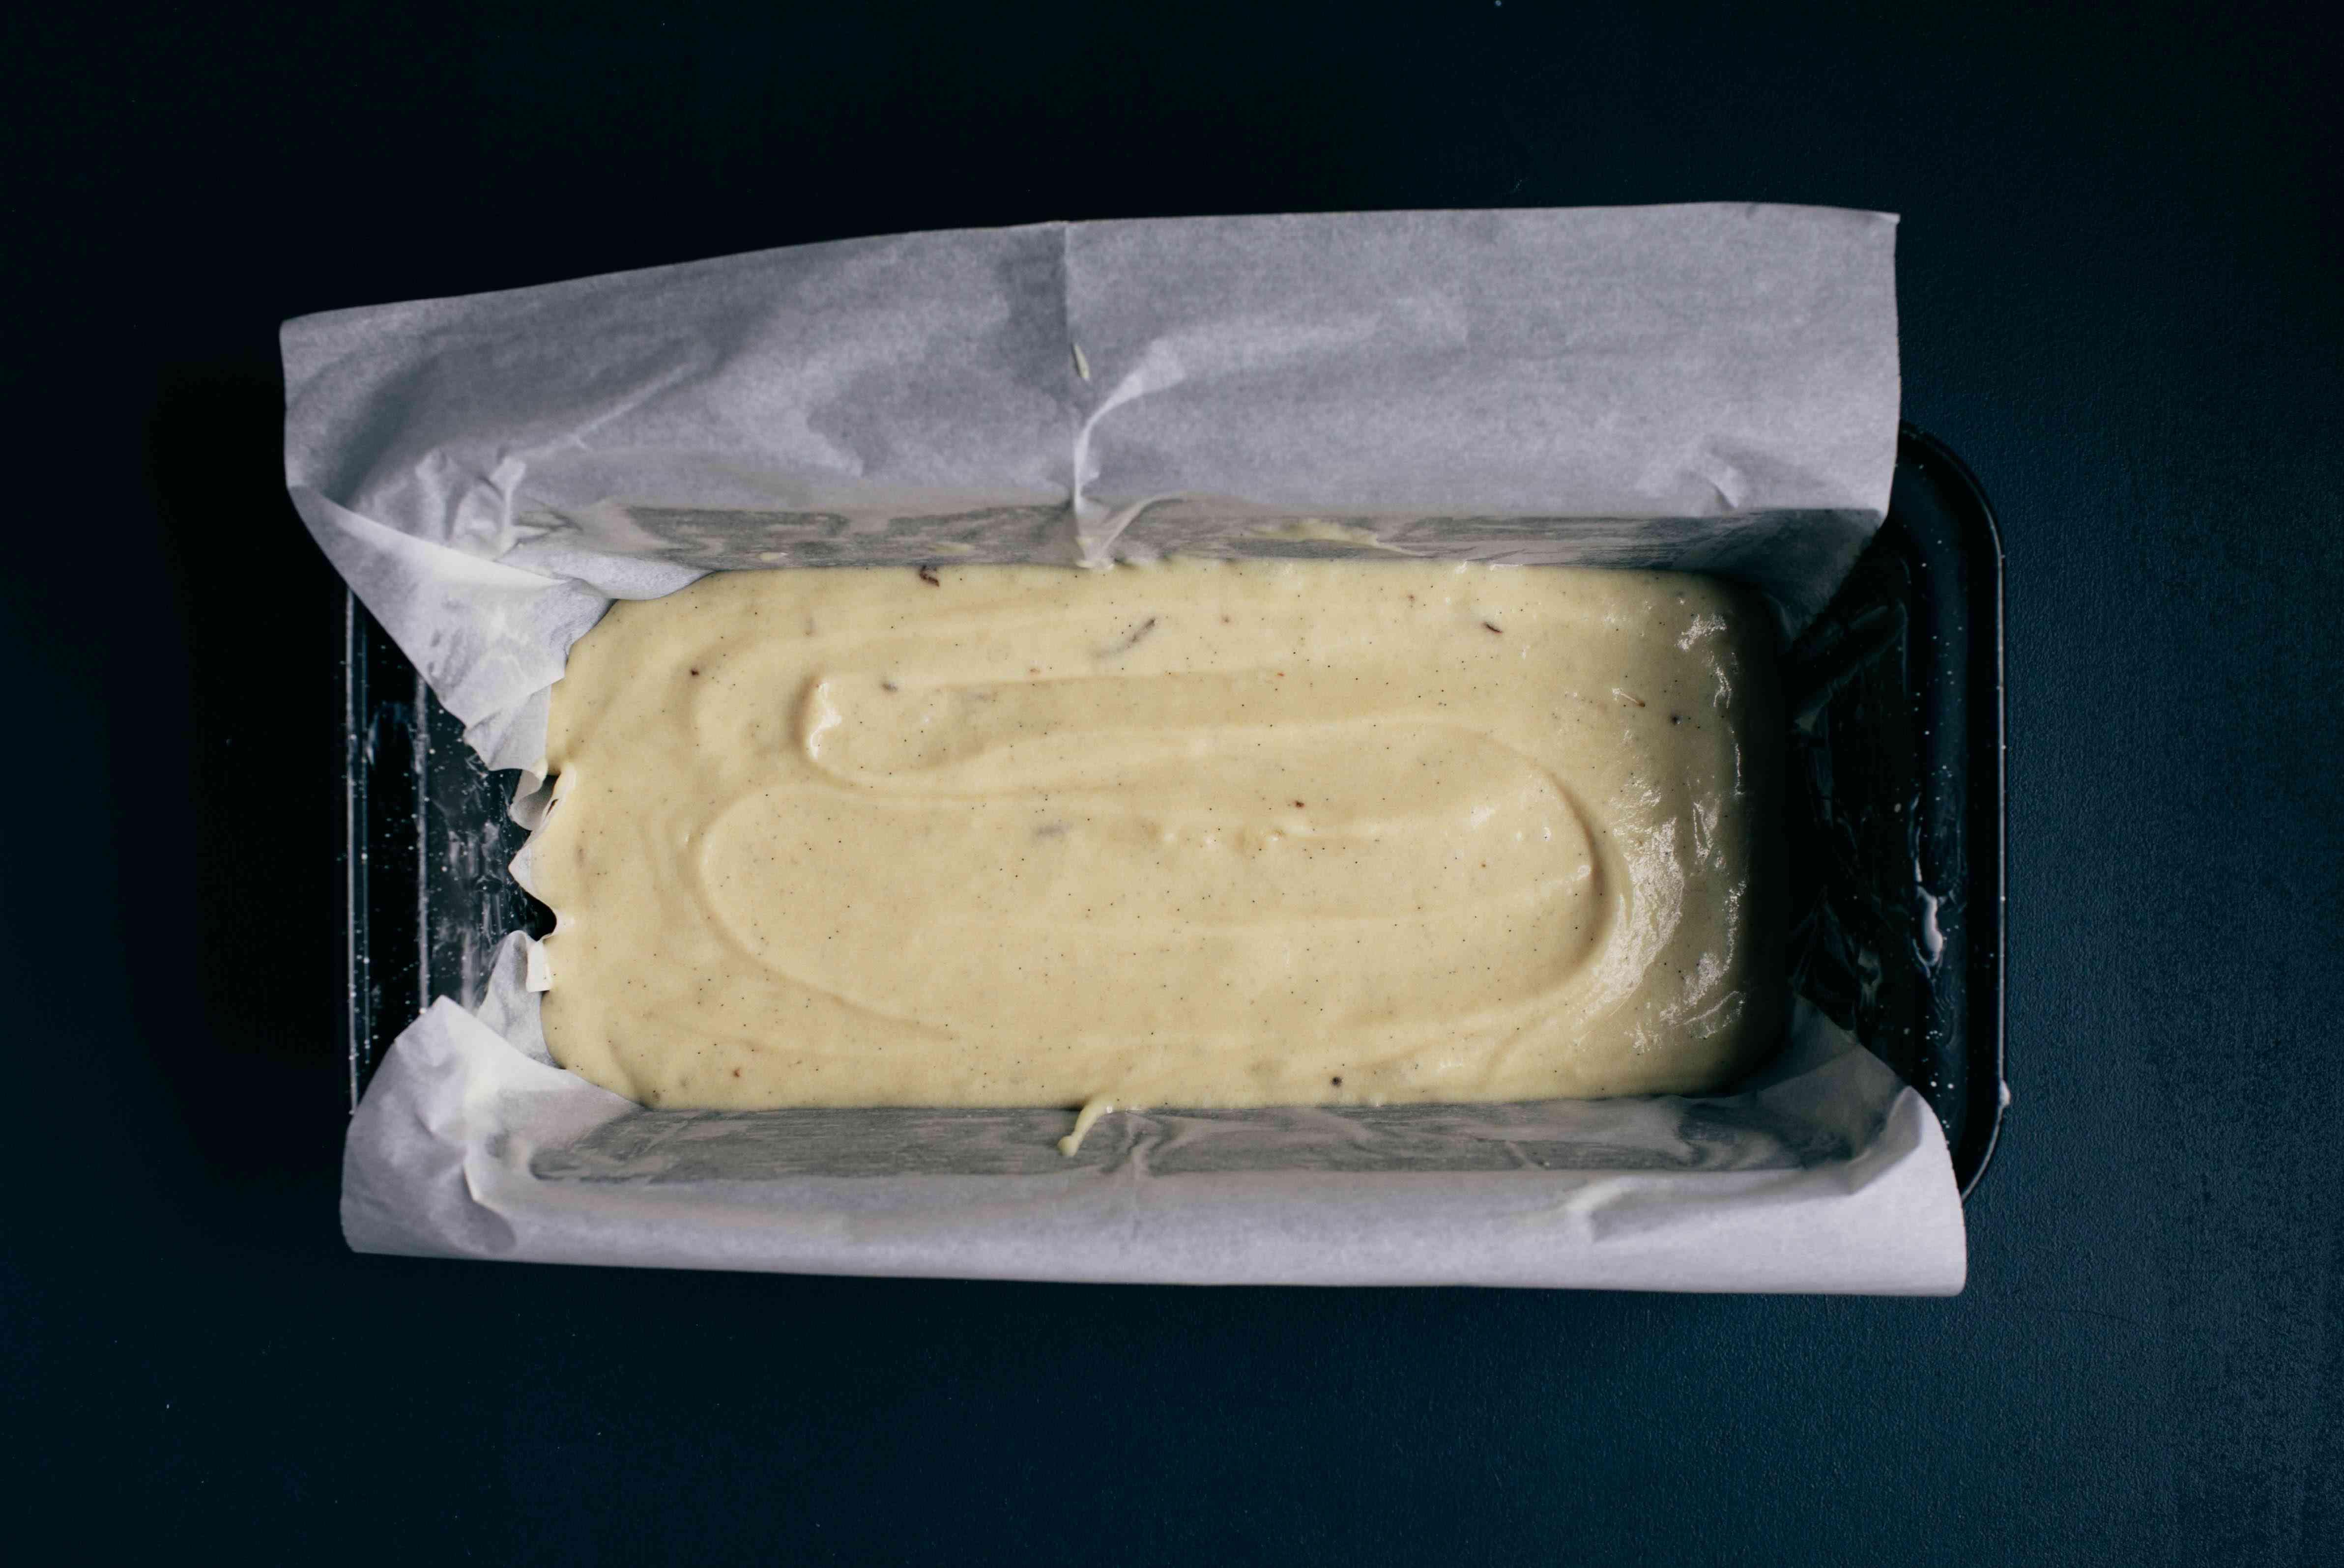 eclair cake batter in pan for baking